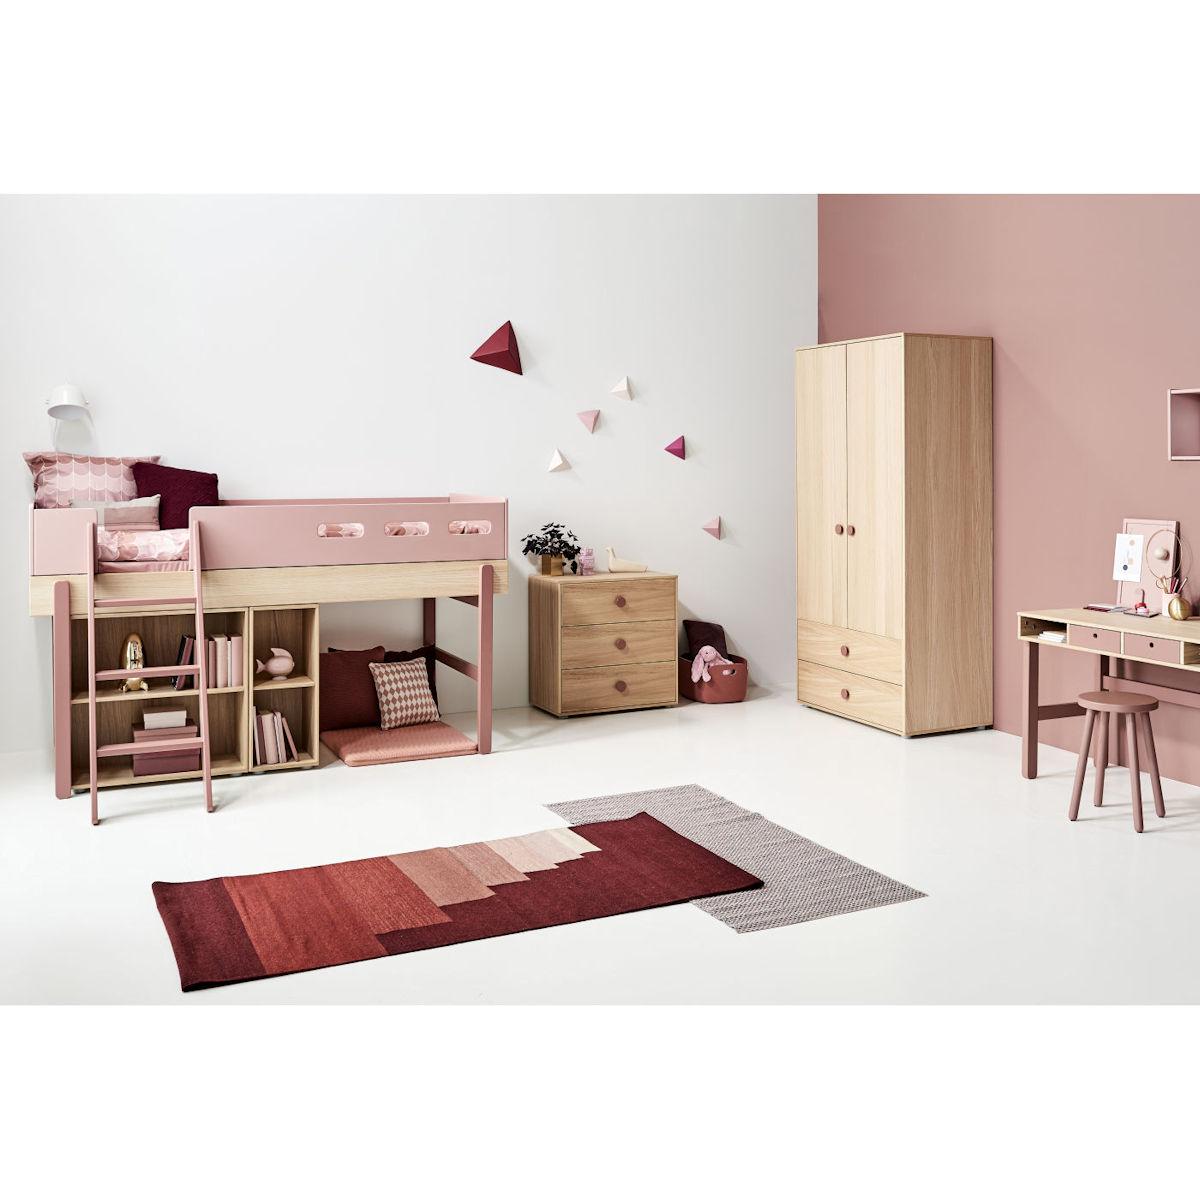 flexa popsicle halbhohes bett 90x200 kiwi 80 24301 31. Black Bedroom Furniture Sets. Home Design Ideas